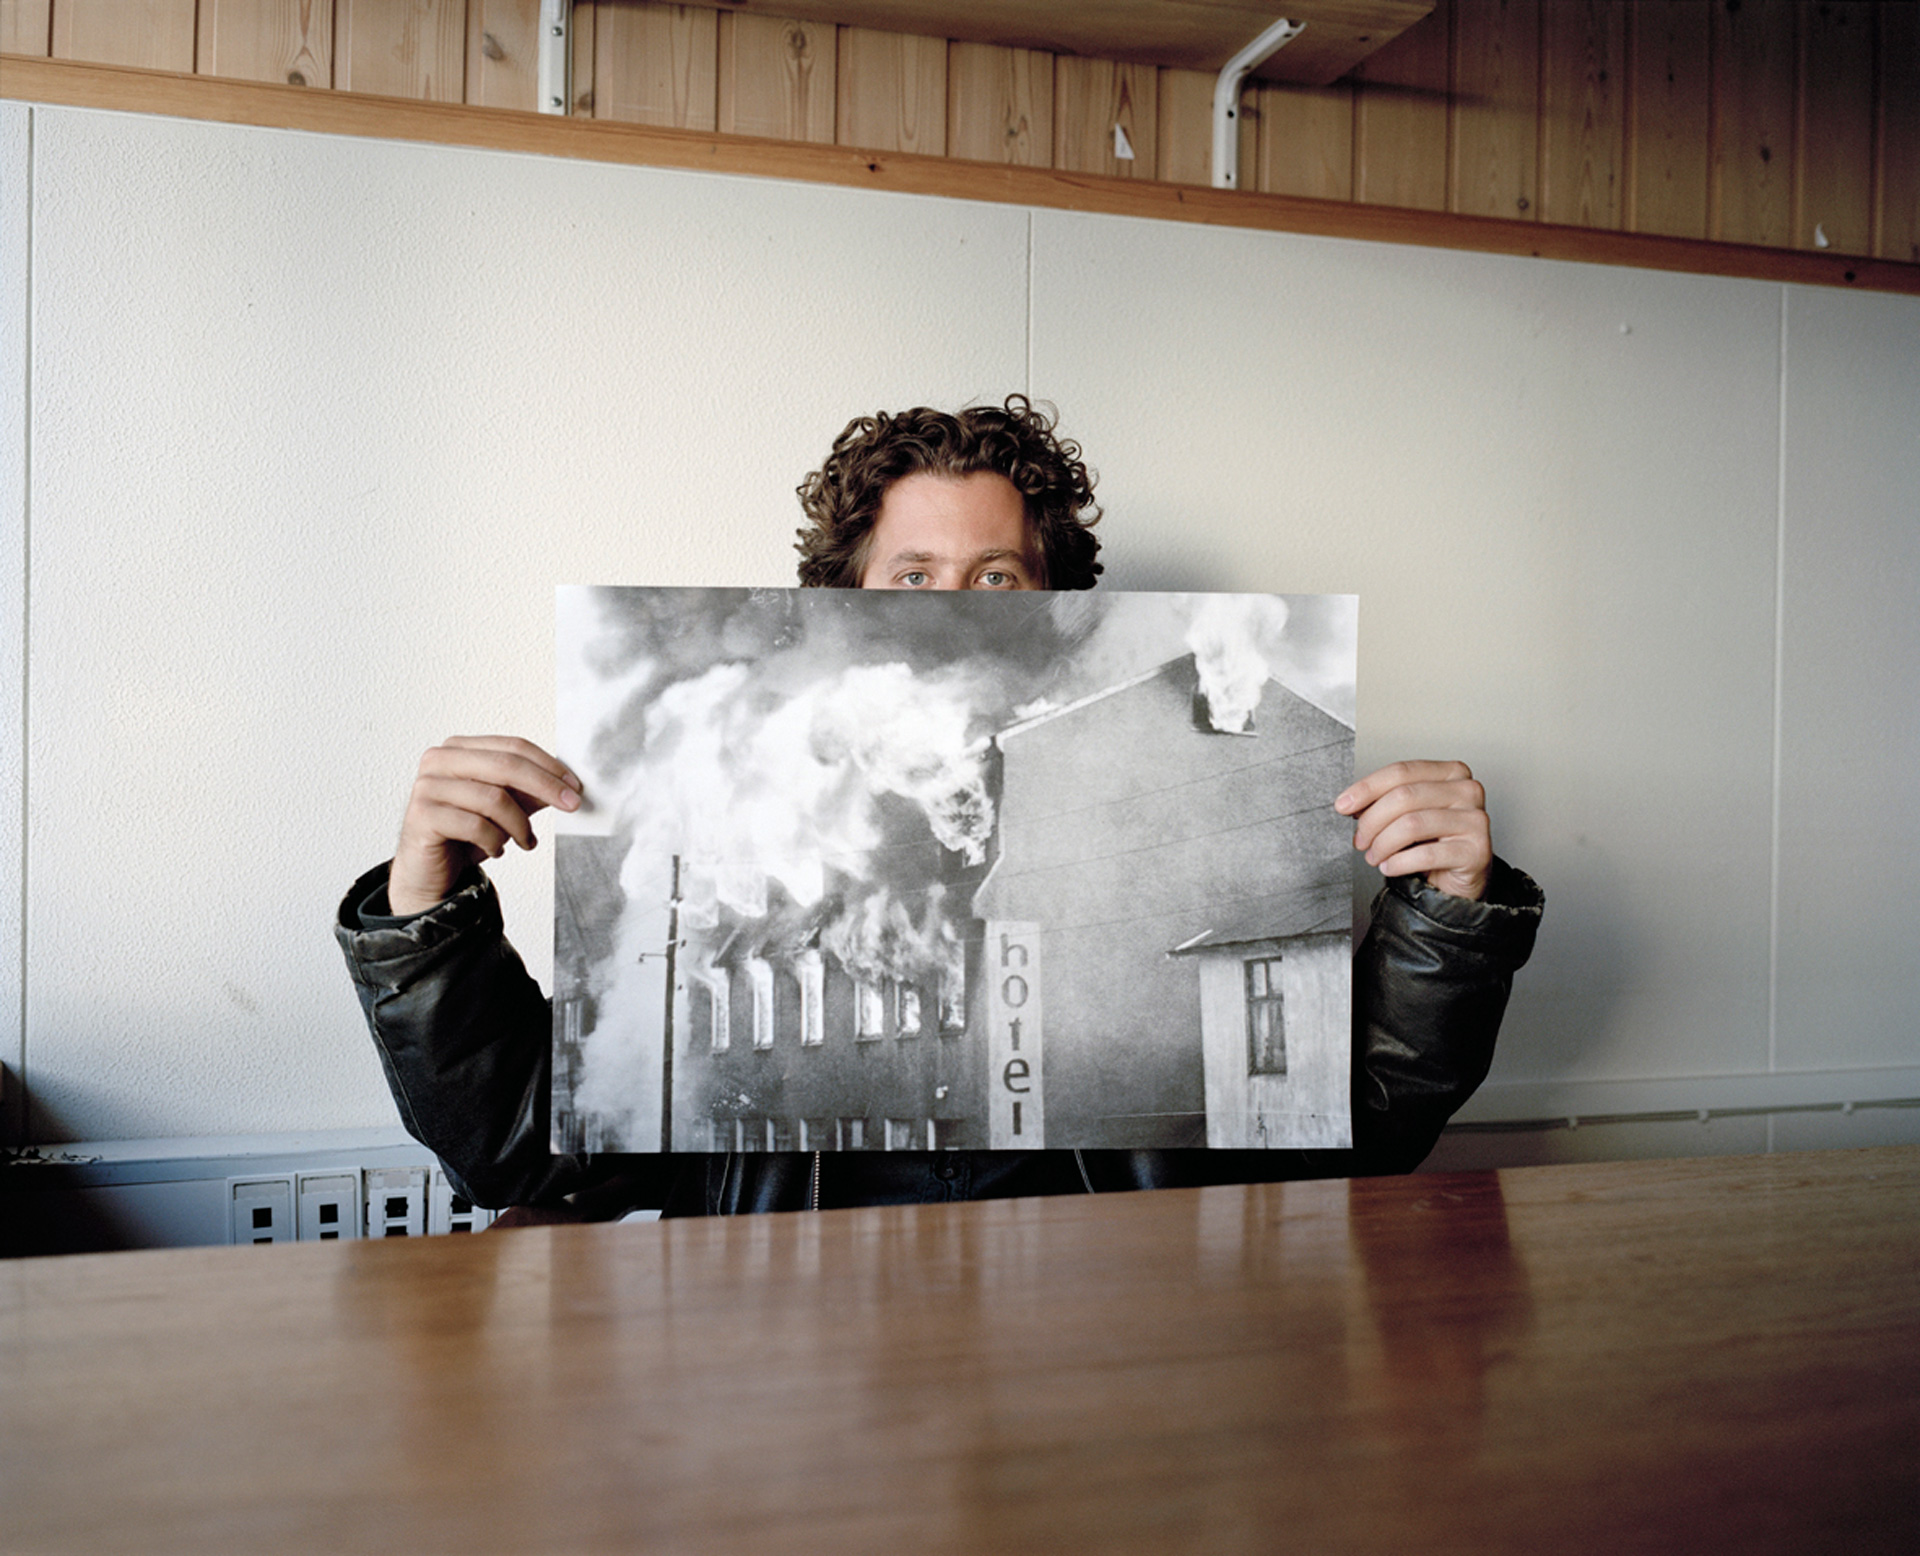 AURELE FERRIER |REYKJAVIK 2009